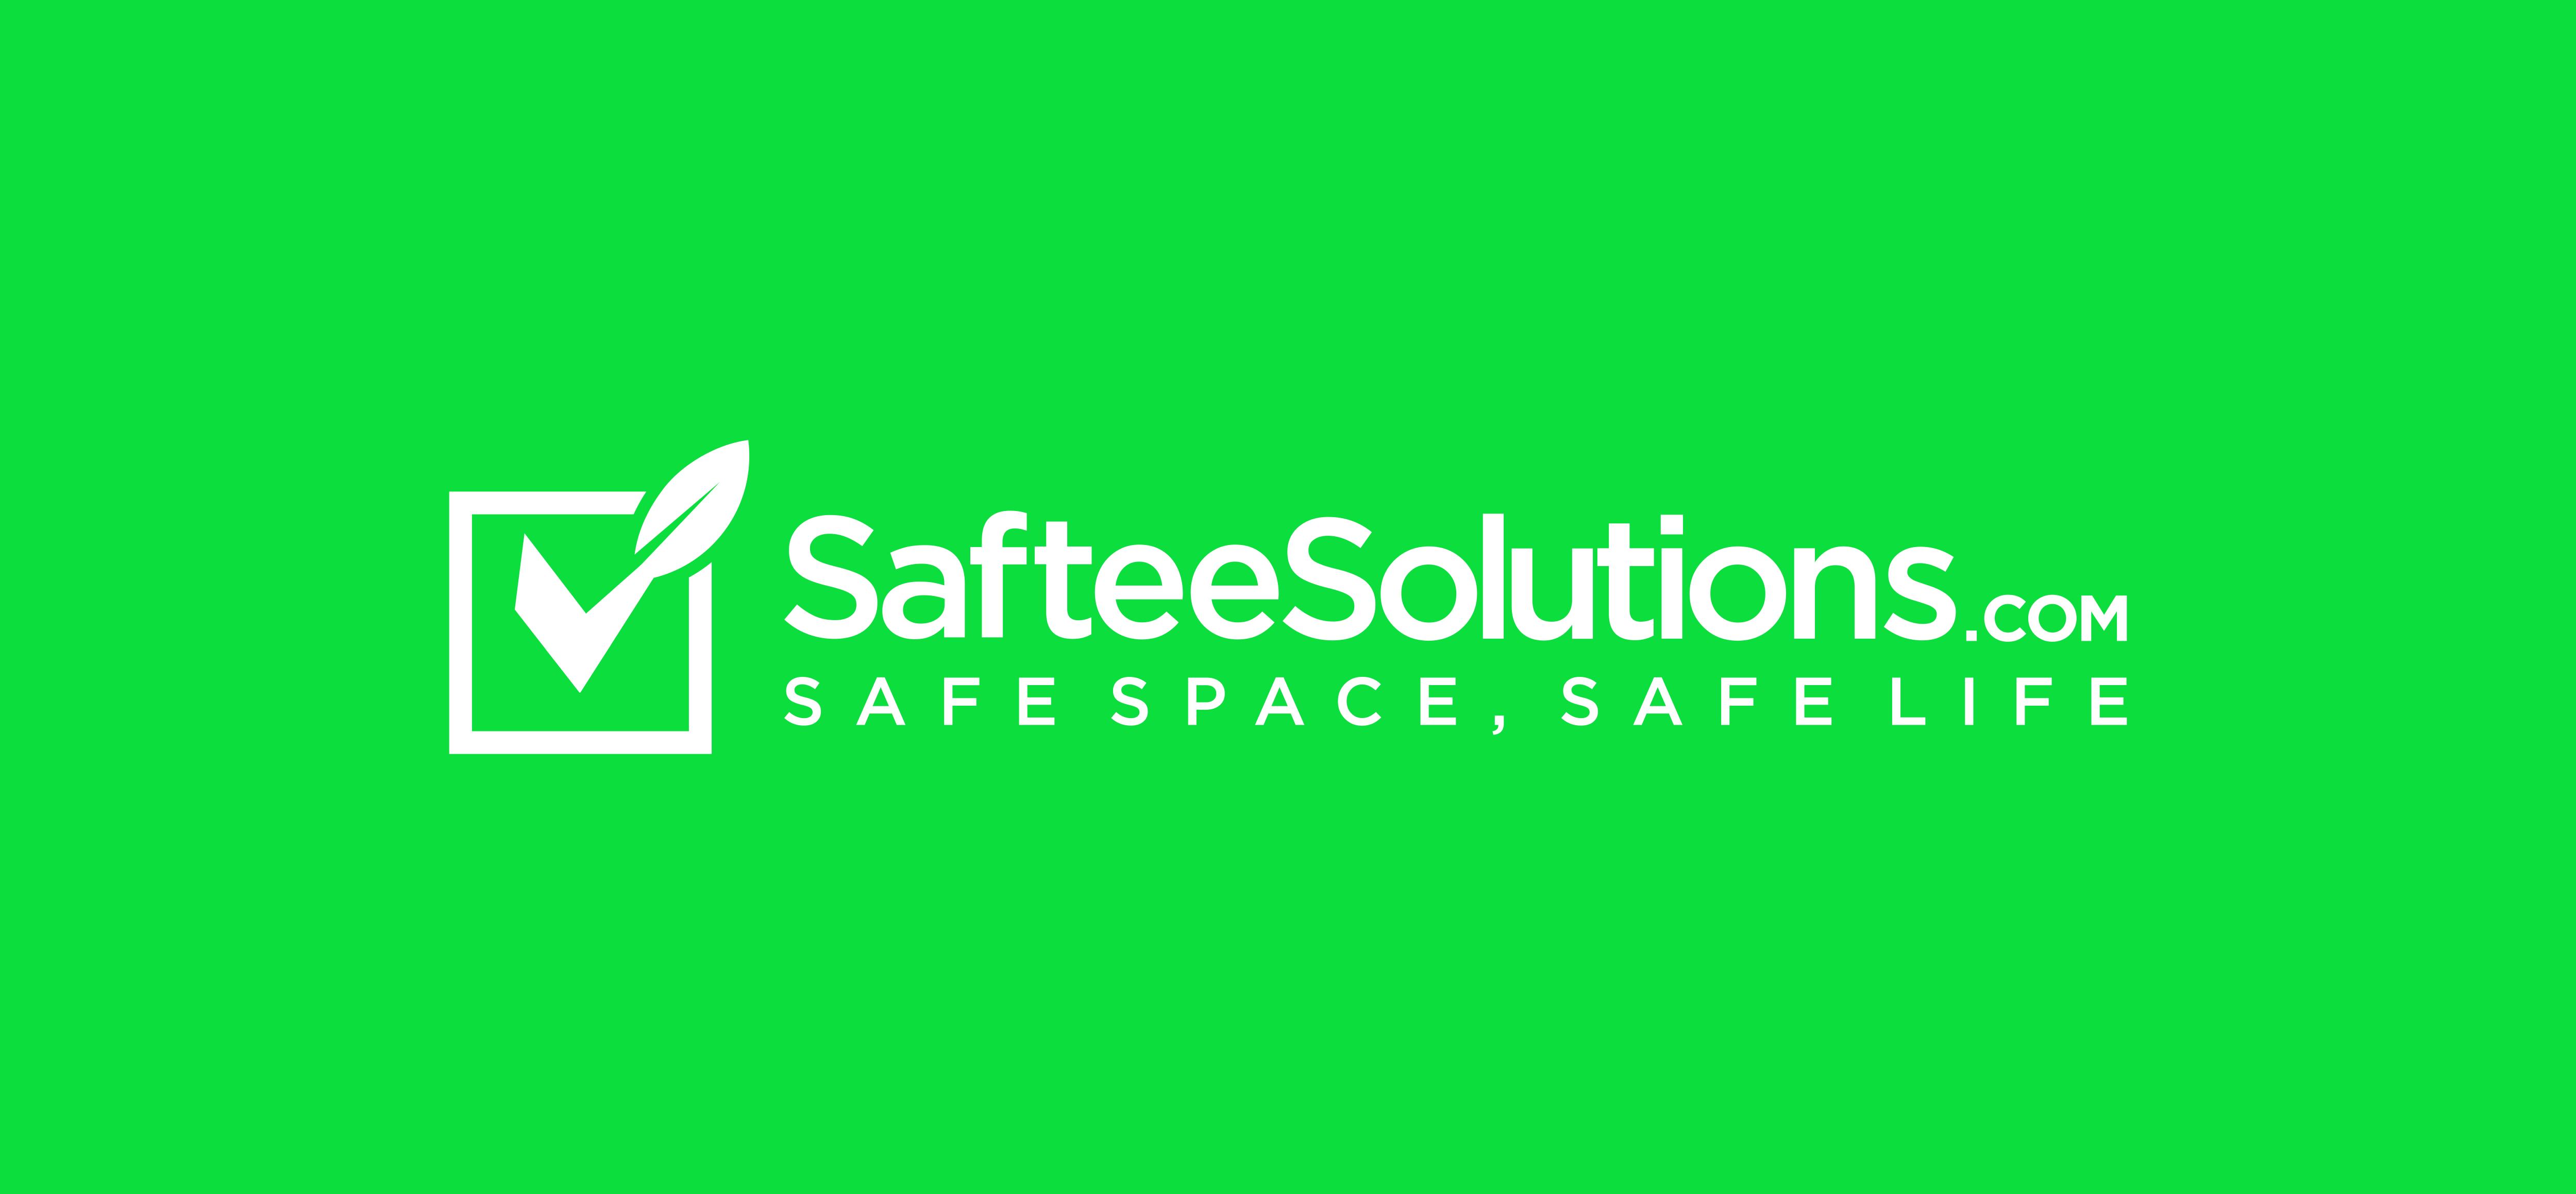 Eye catching logo for a sanitization company